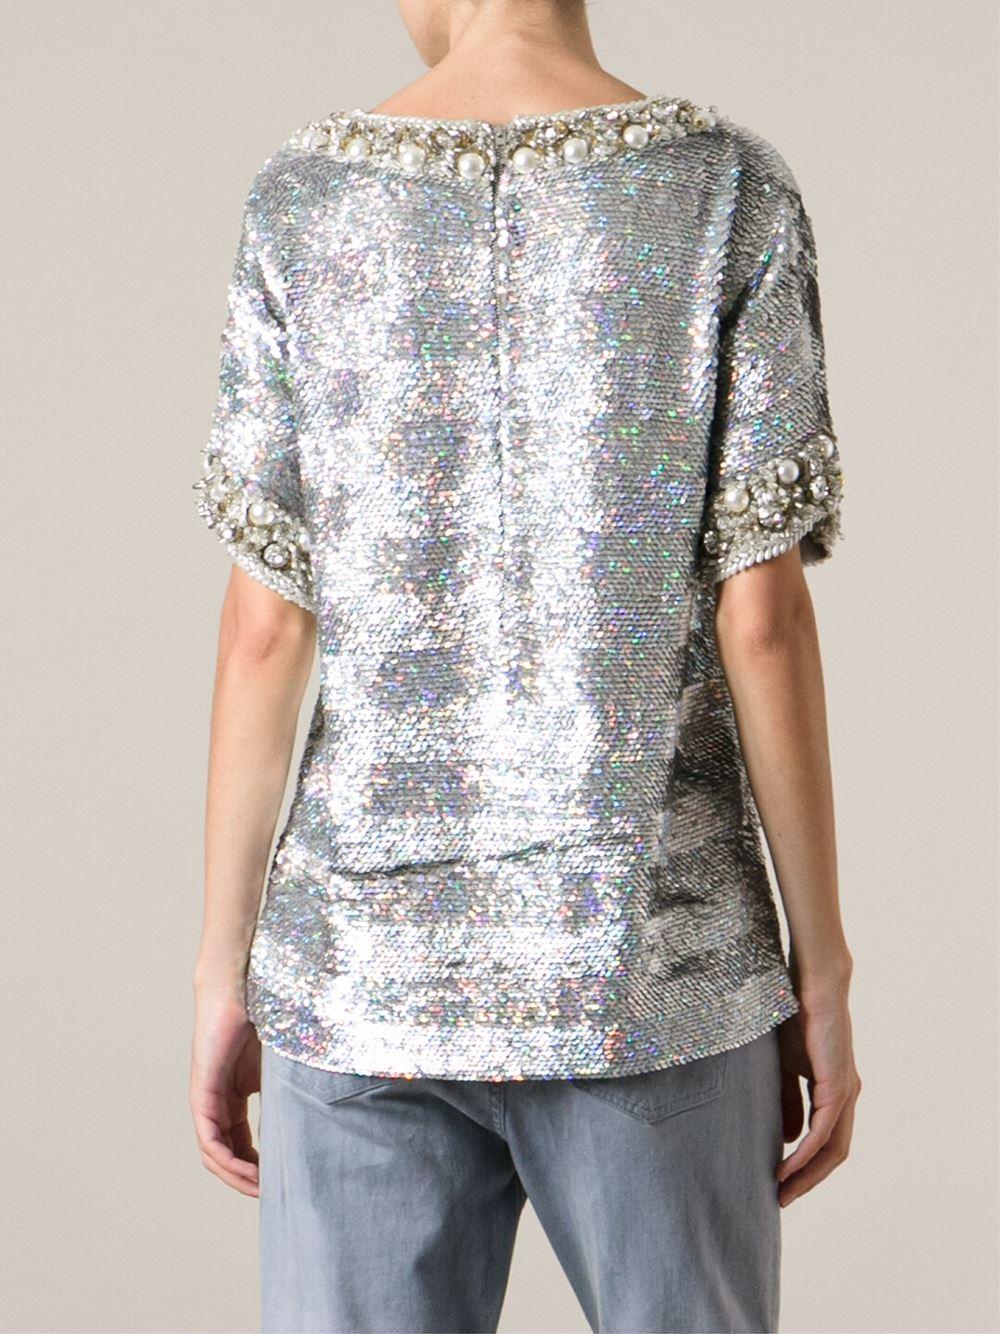 Lyst ashish sequin embellished t shirt in metallic for Silver metallic shirt women s